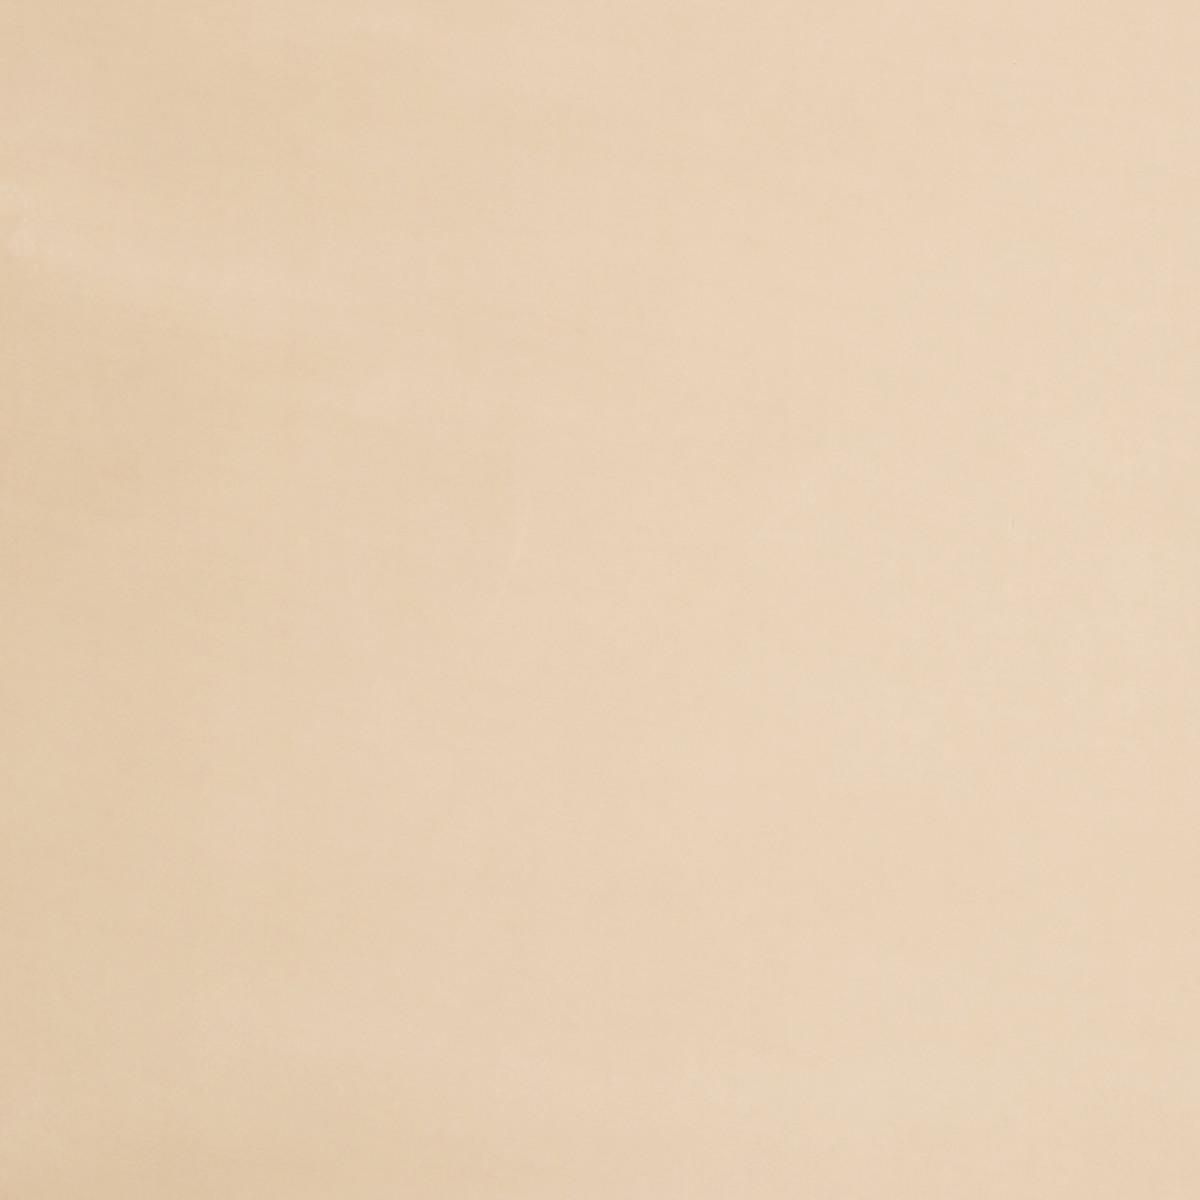 Ткань однотонный М.Монорай светло-золотой 280 см 1 пог. м